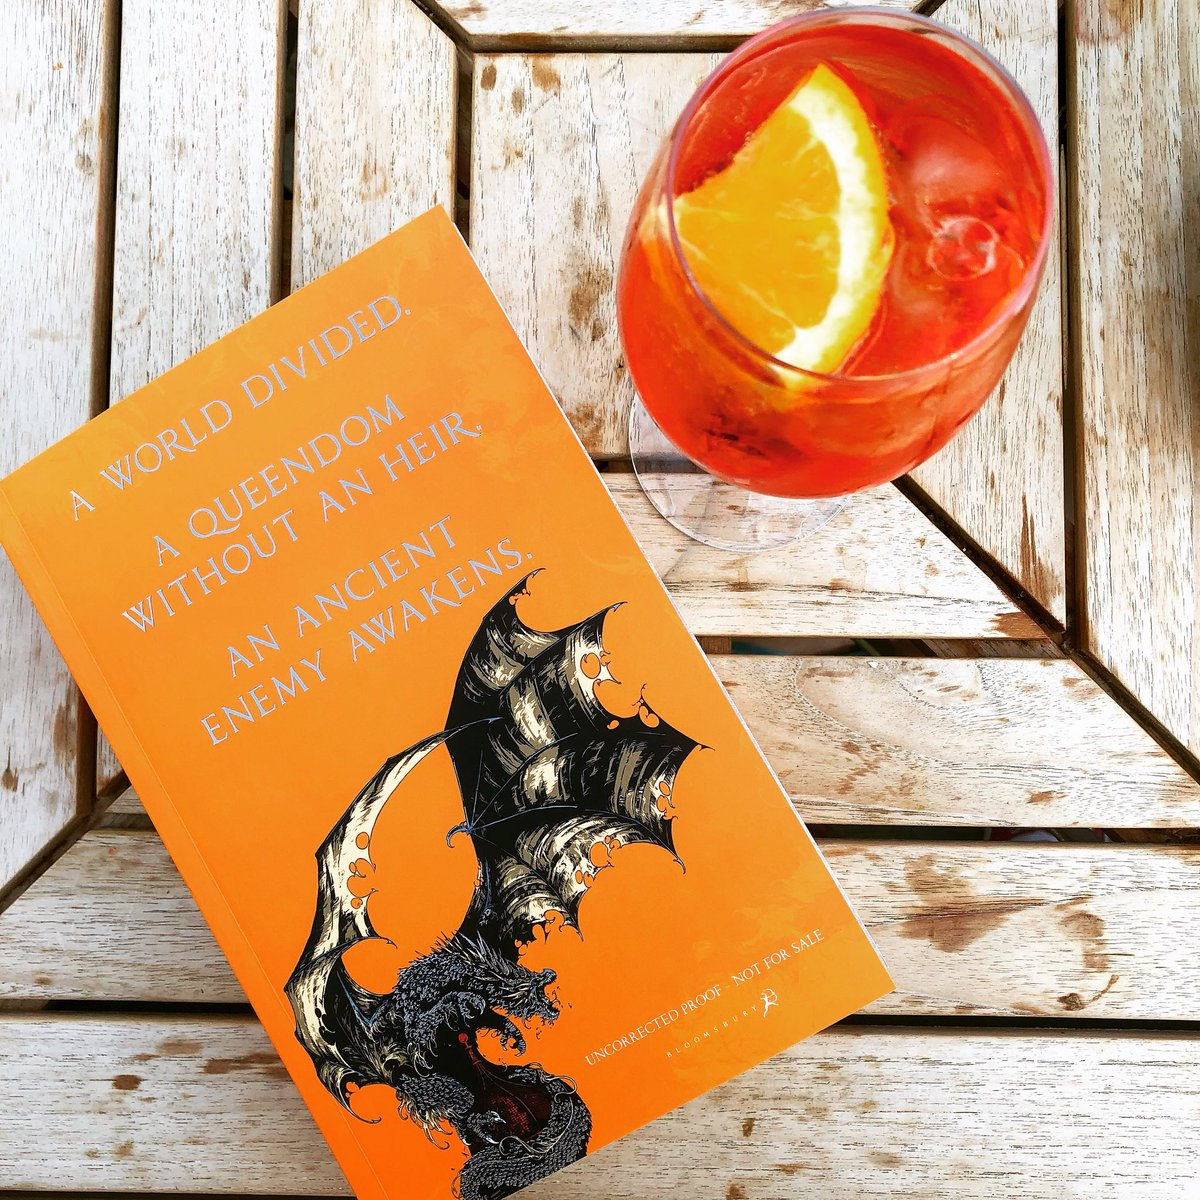 RT @AlwynFJH: Orange Drink orange Book 🍊🐉 #ThePrioryOfTheOrangeTree https://t.co/8w00sipR3r https://t.co/esvnSUFXQm